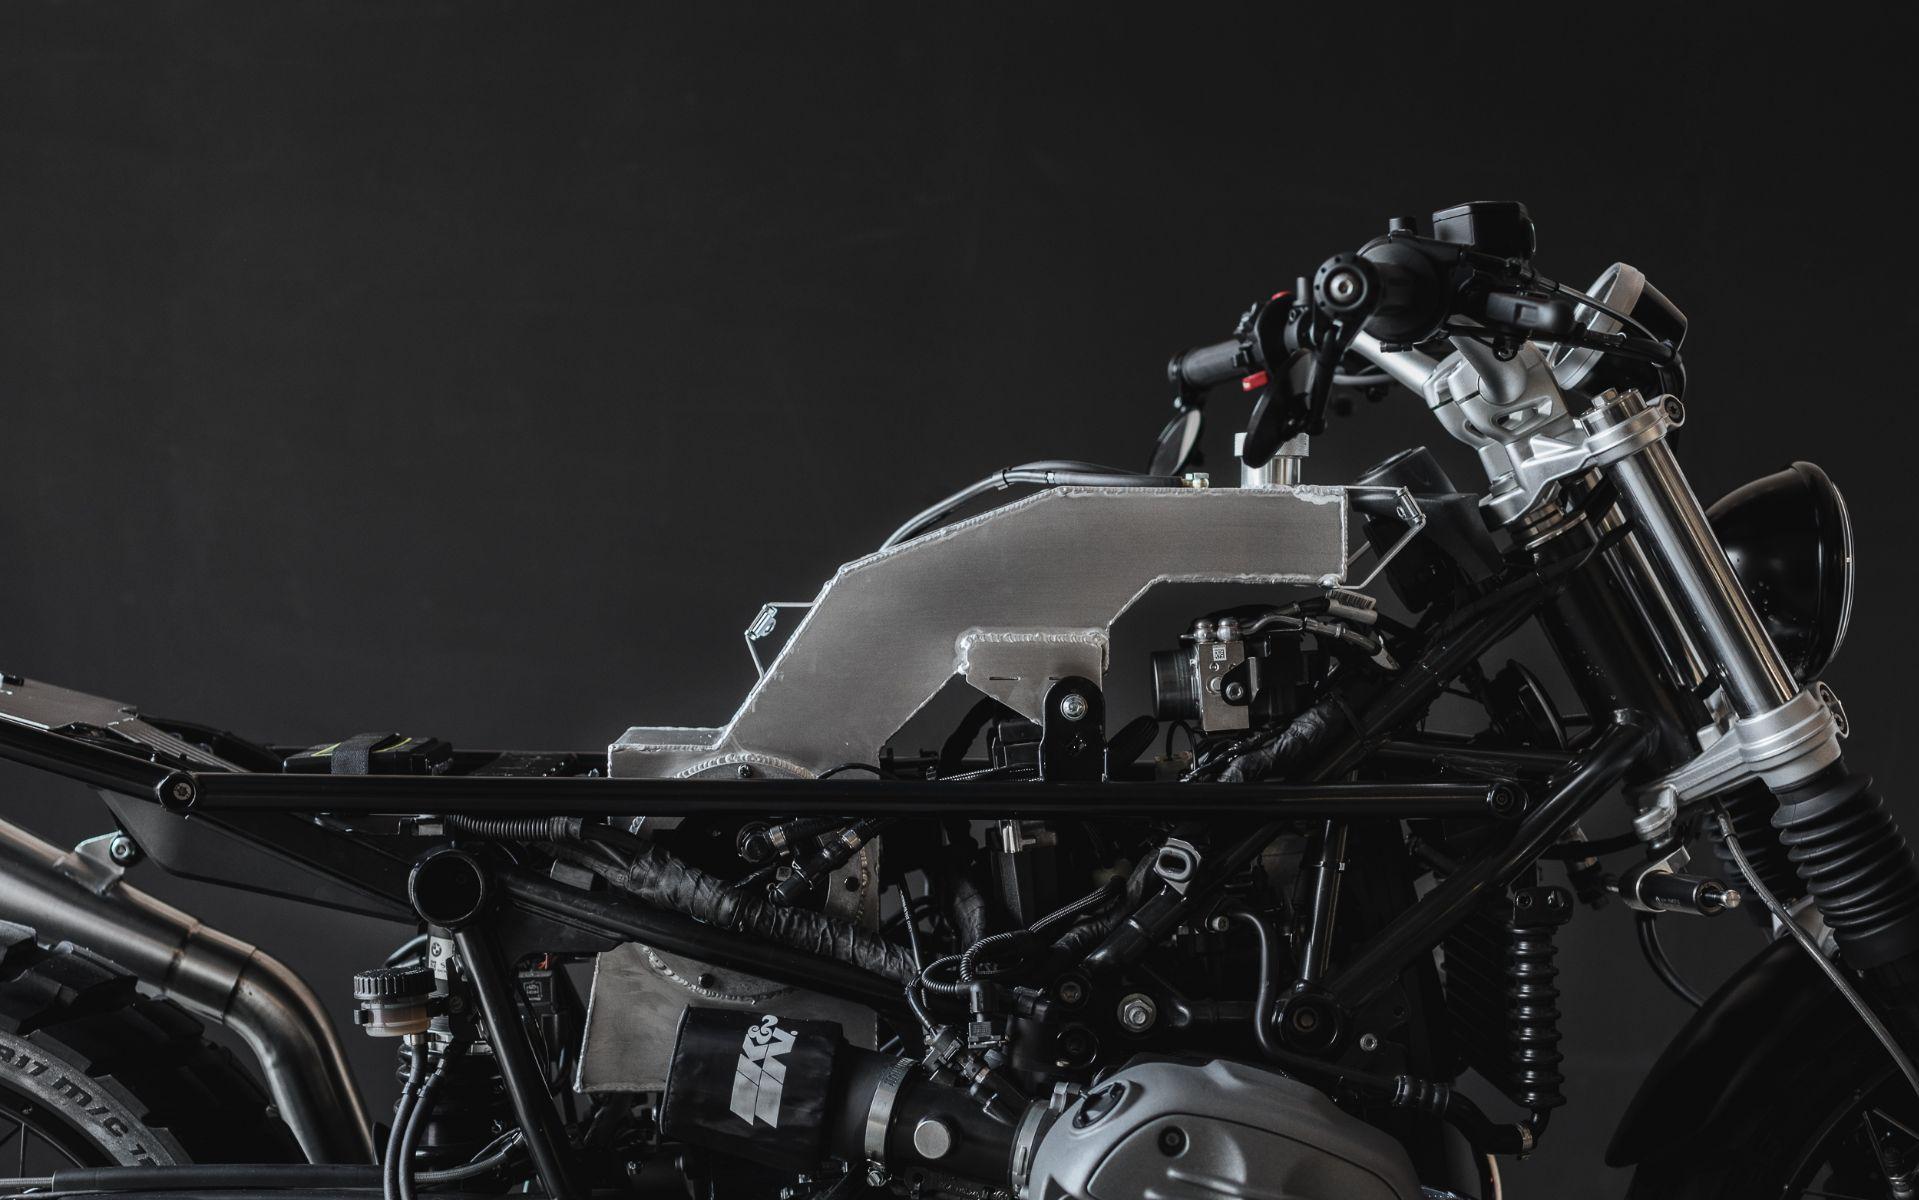 BMW RnineT kit conversion cafe racer scrambler